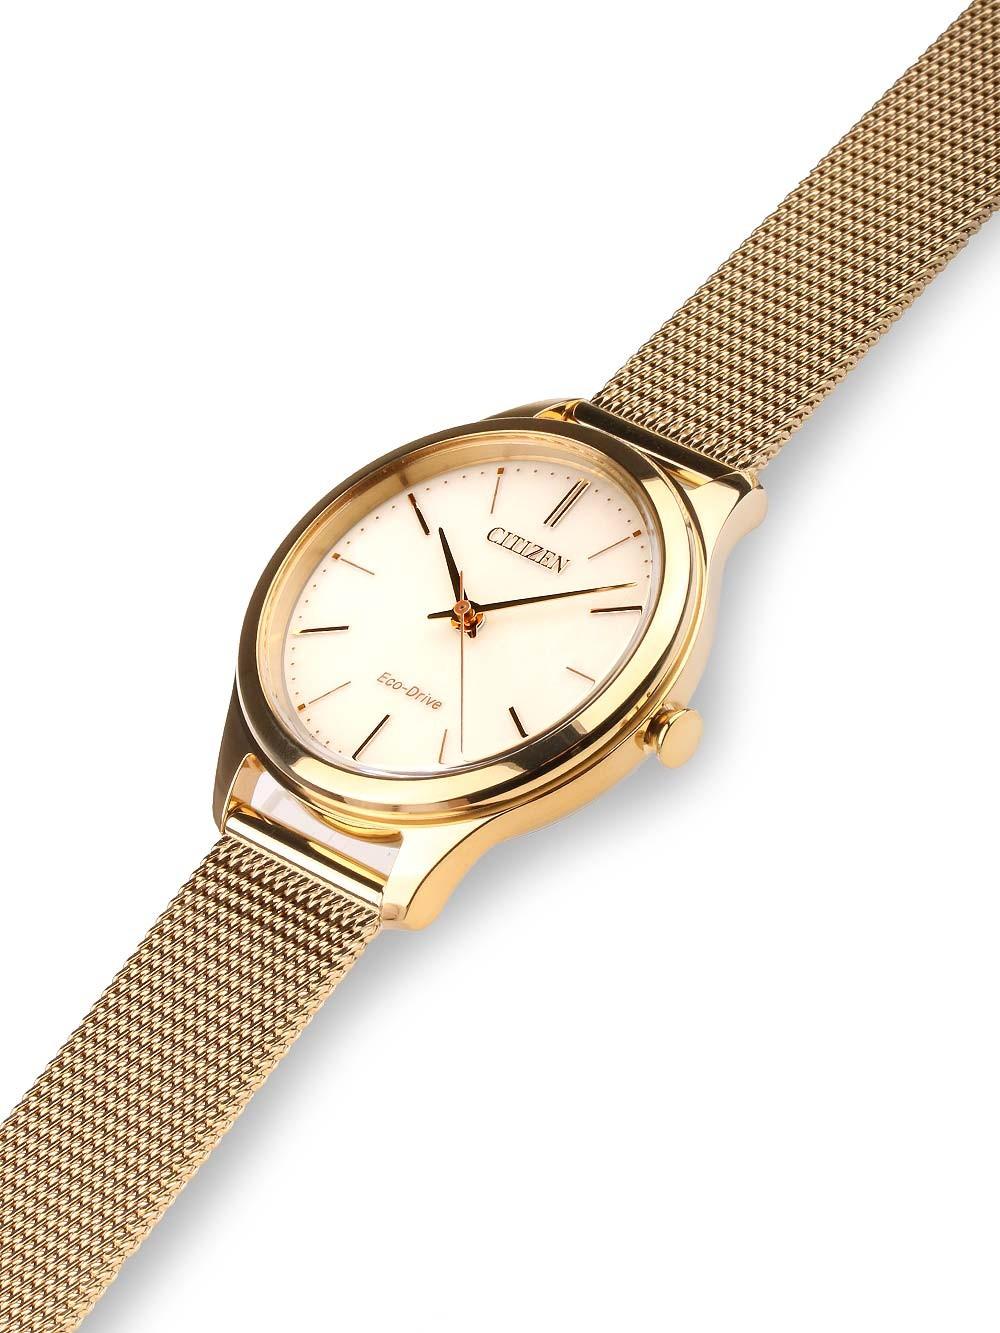 watches chrono12 citizen em0502 86p eco drive elegant damen 32mm 5atm. Black Bedroom Furniture Sets. Home Design Ideas